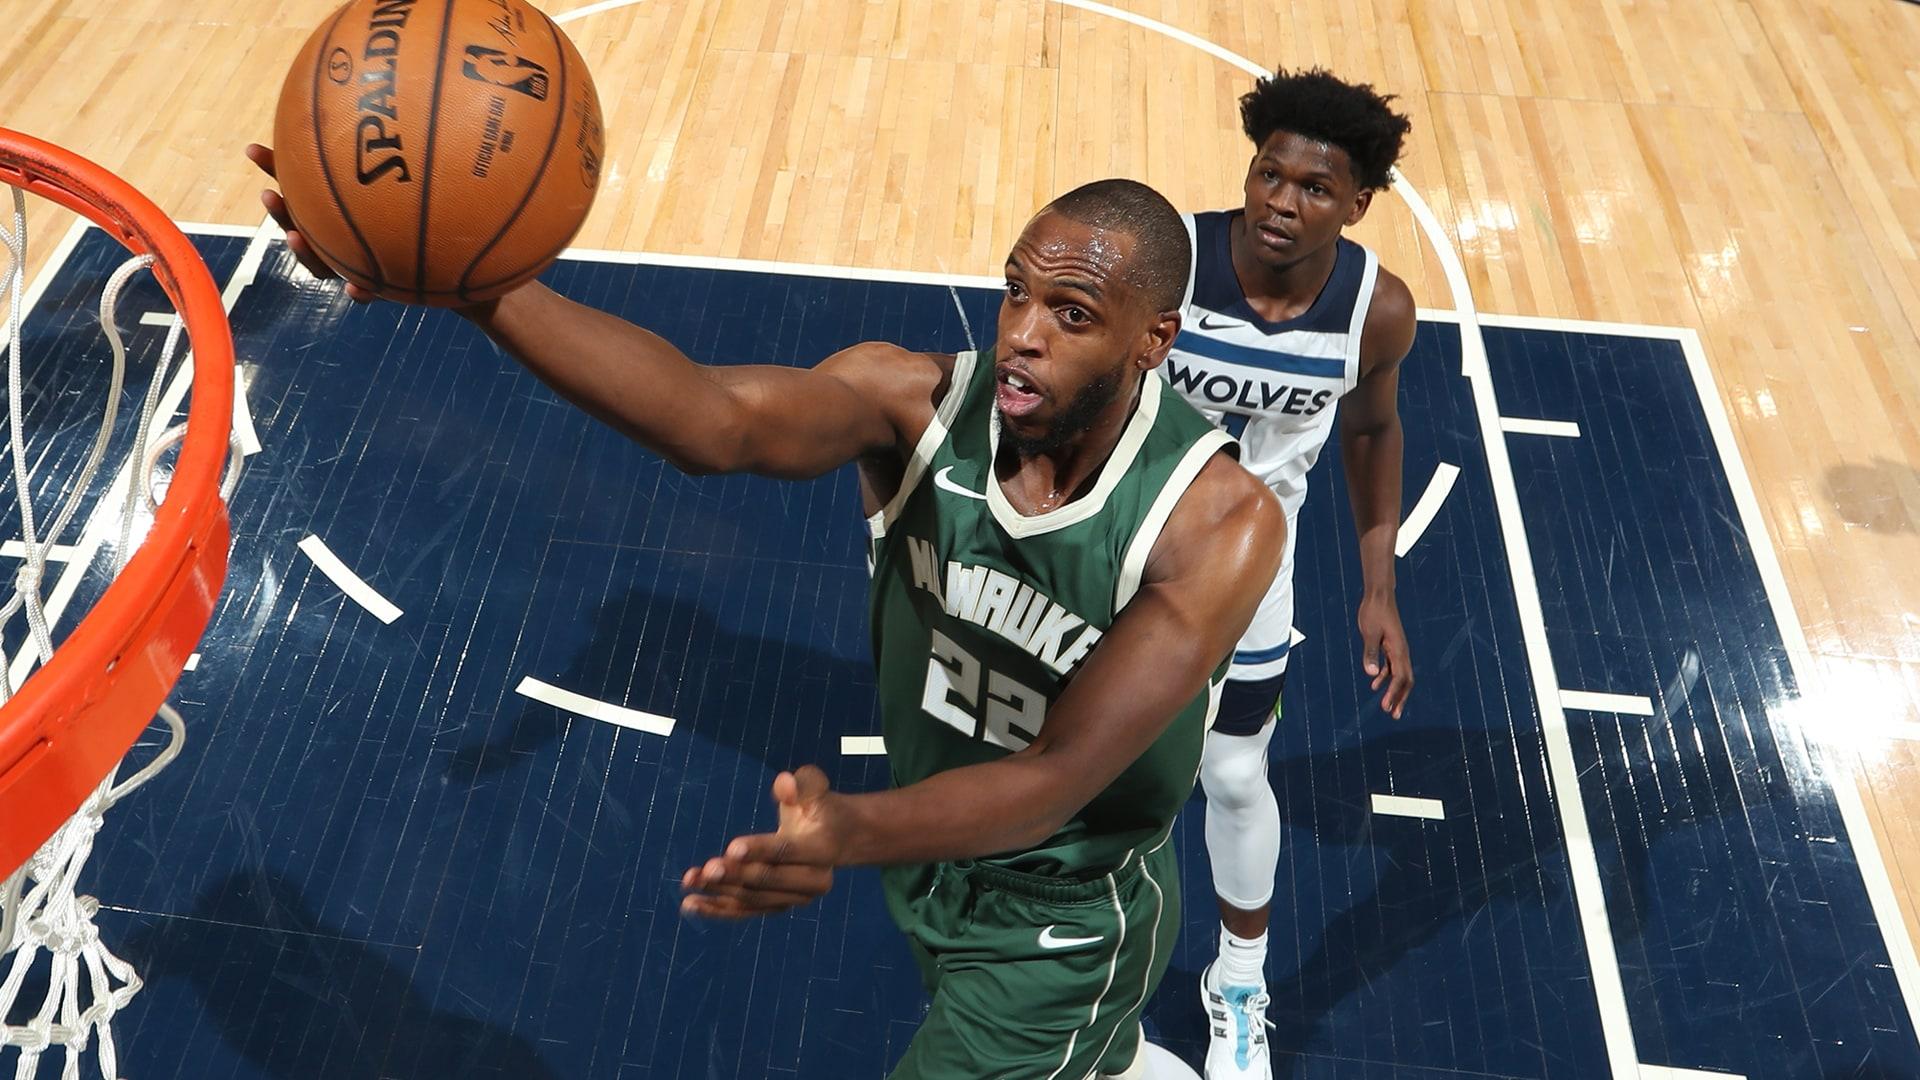 Game Recap: Bucks 130, Timberwolves 105